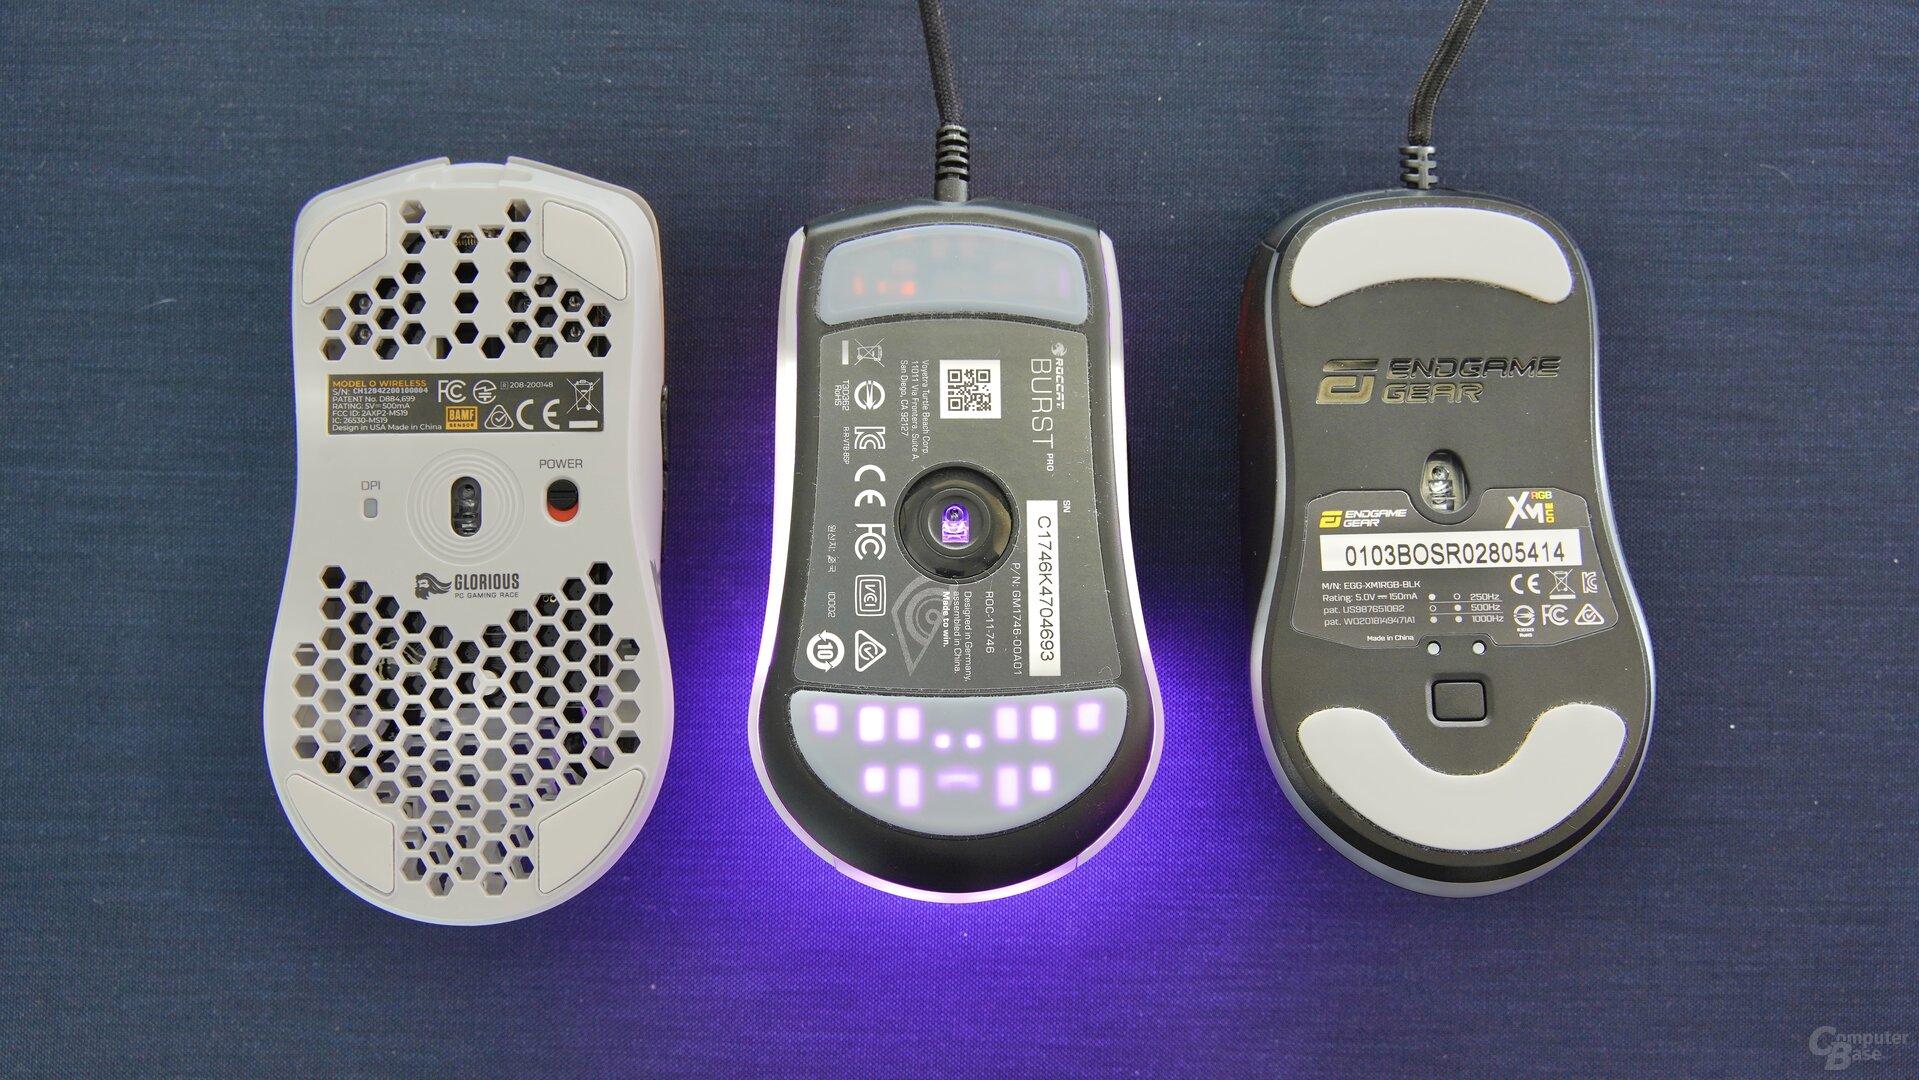 Glorious Model O Wireless, Roccat Burst Pro & Endgame Gear XM1